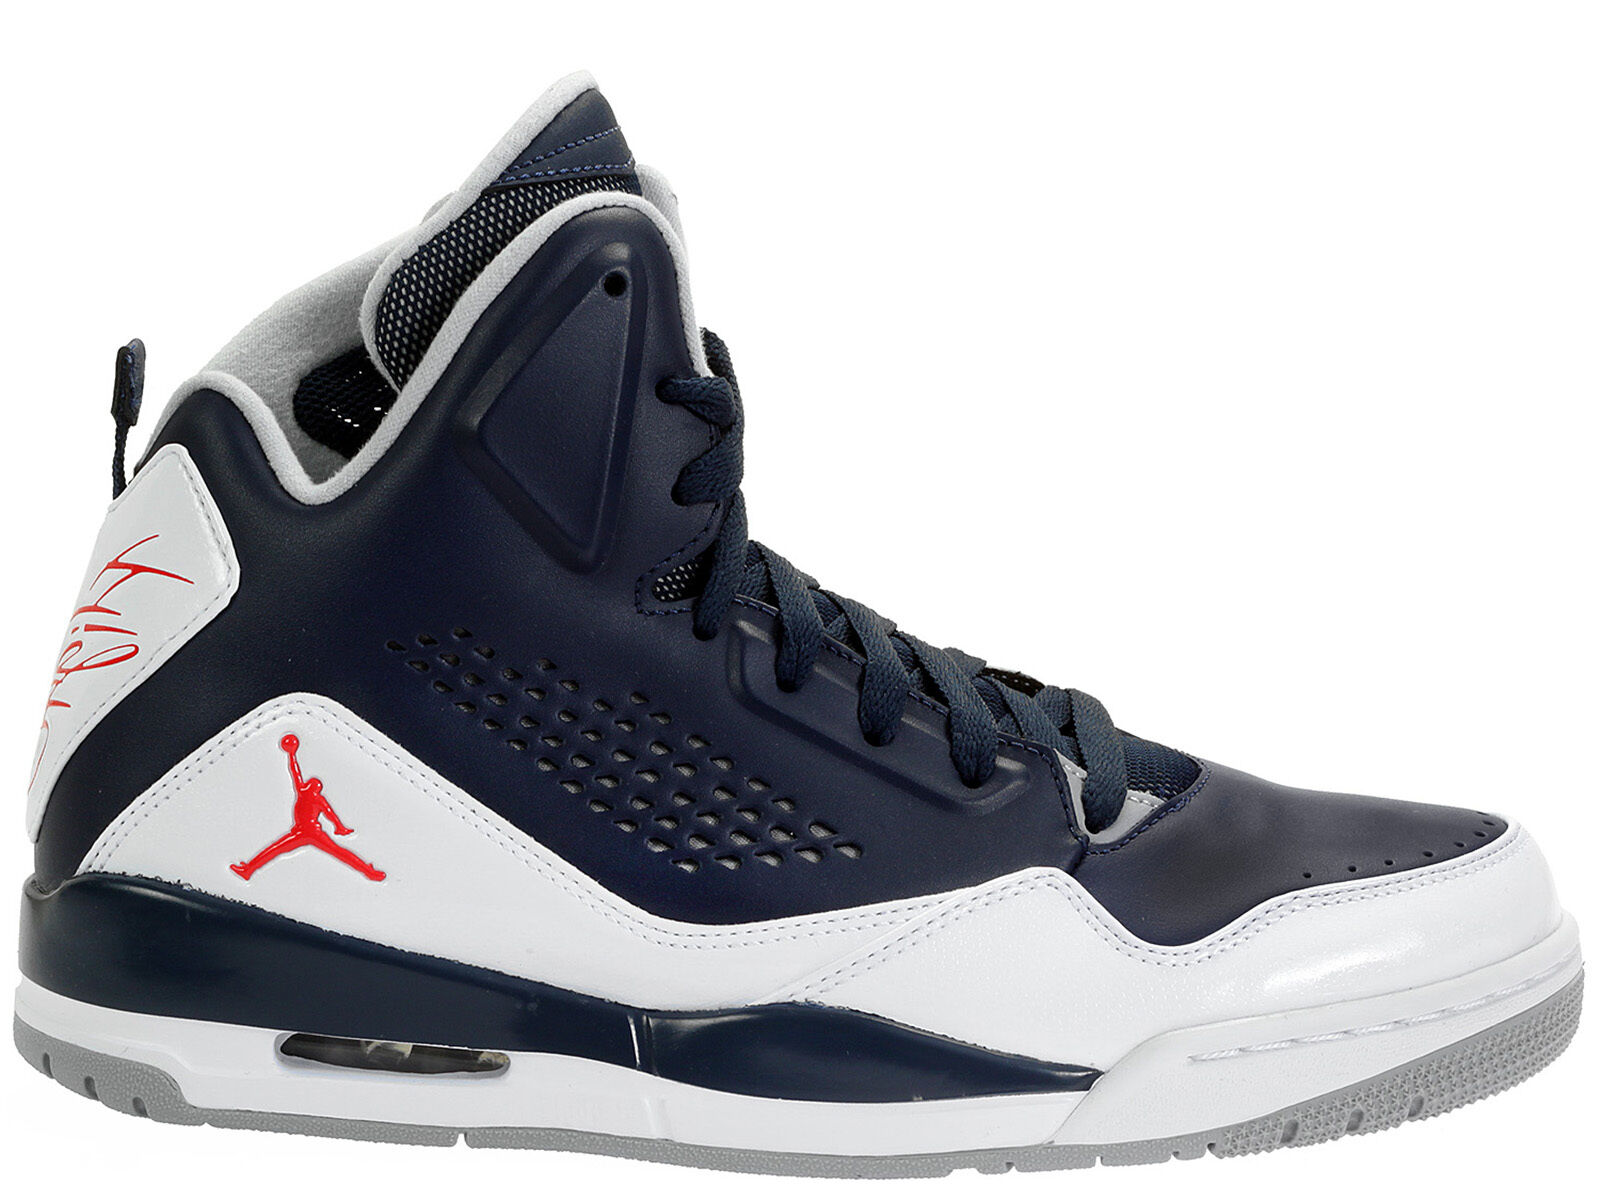 Brand New Jordan SC-3 Men's Athletic Fashion Sneakers [629877 407]